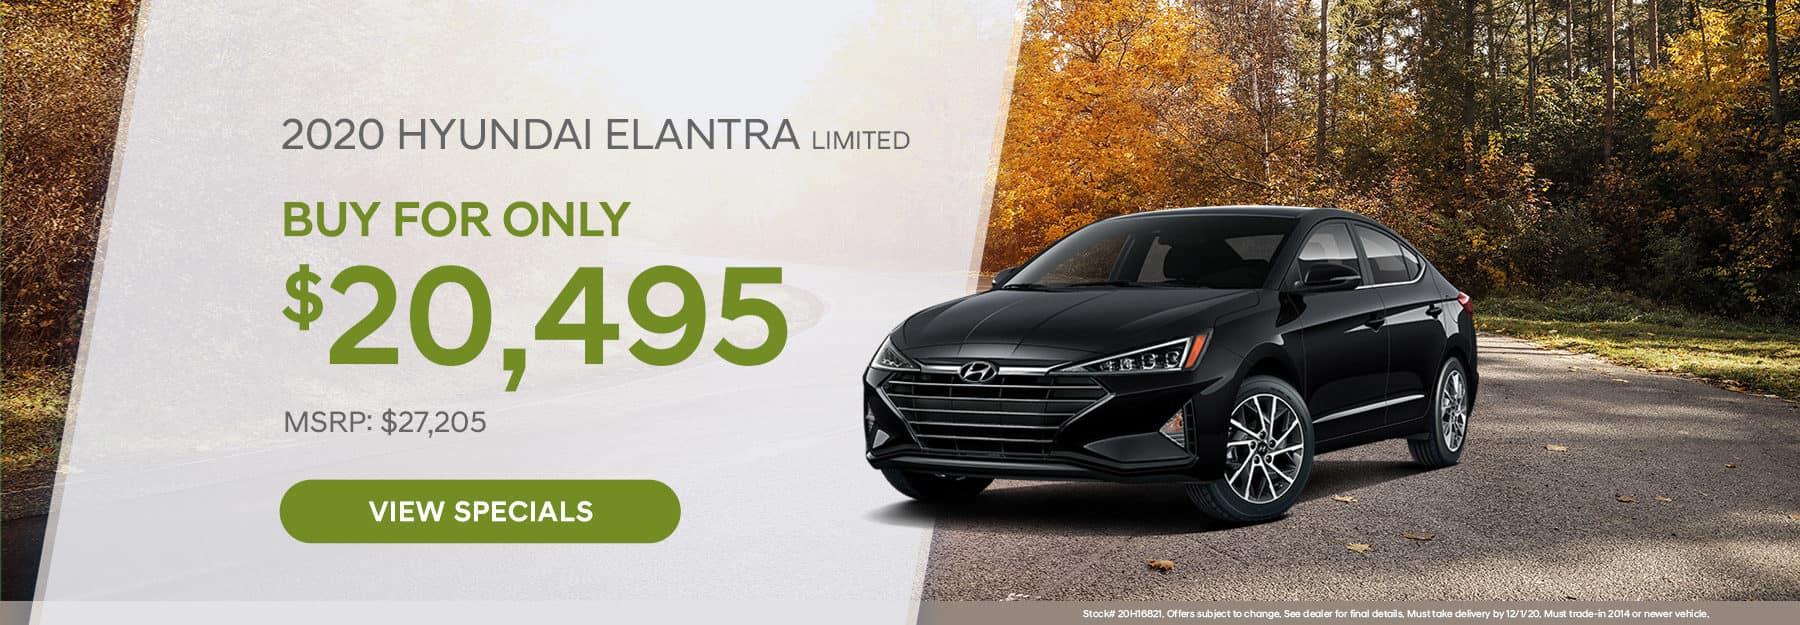 elantra-limited-NOV-2020